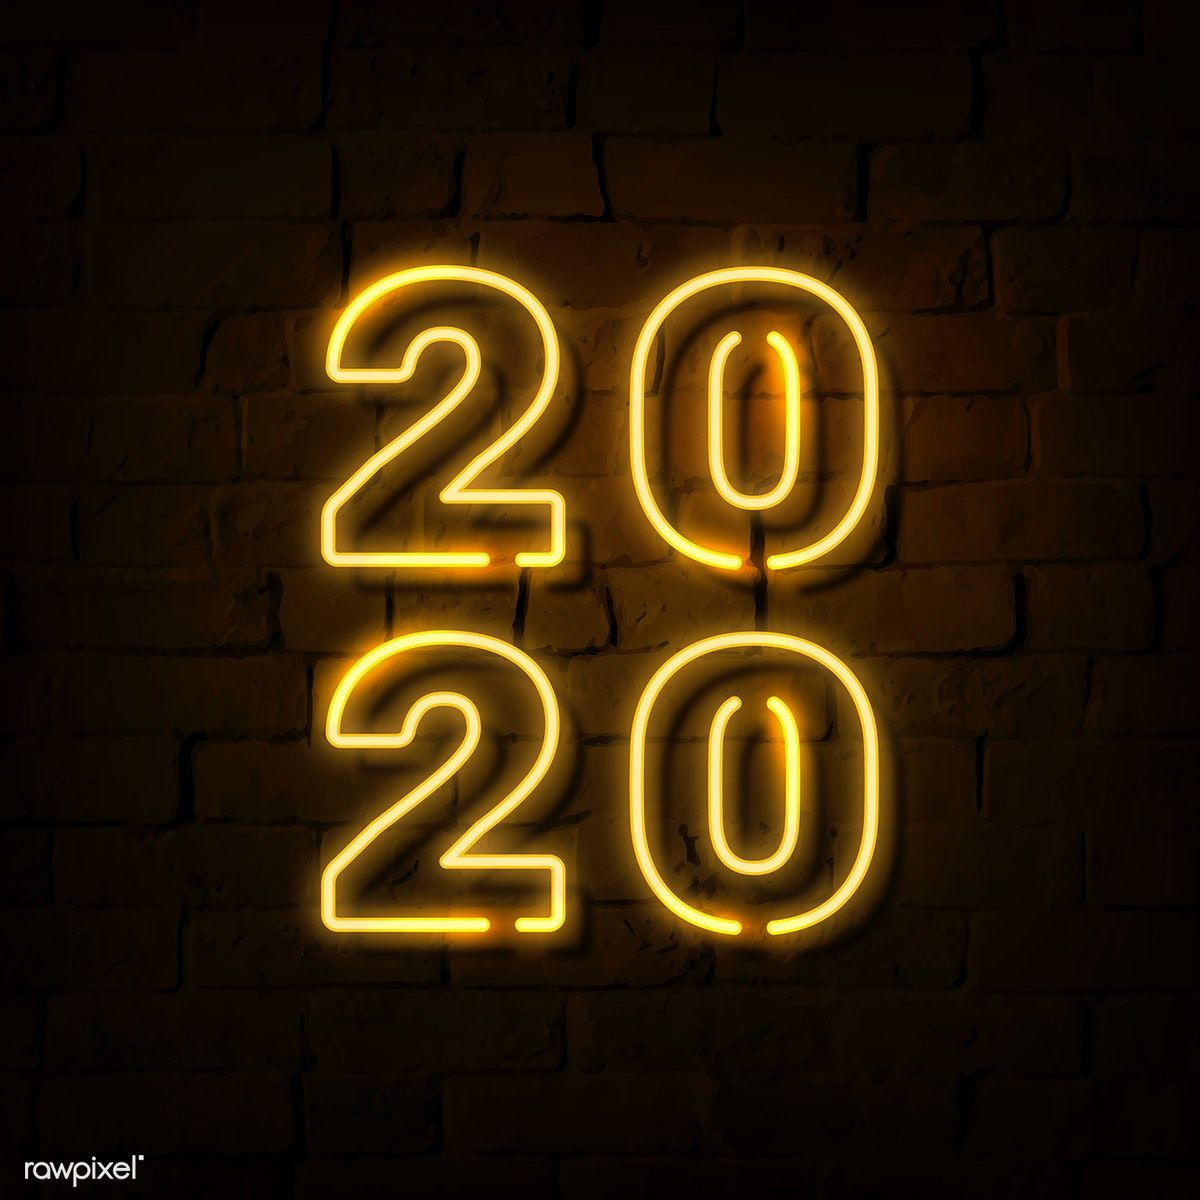 Download premium vector of Bright neon yellow 2020 social